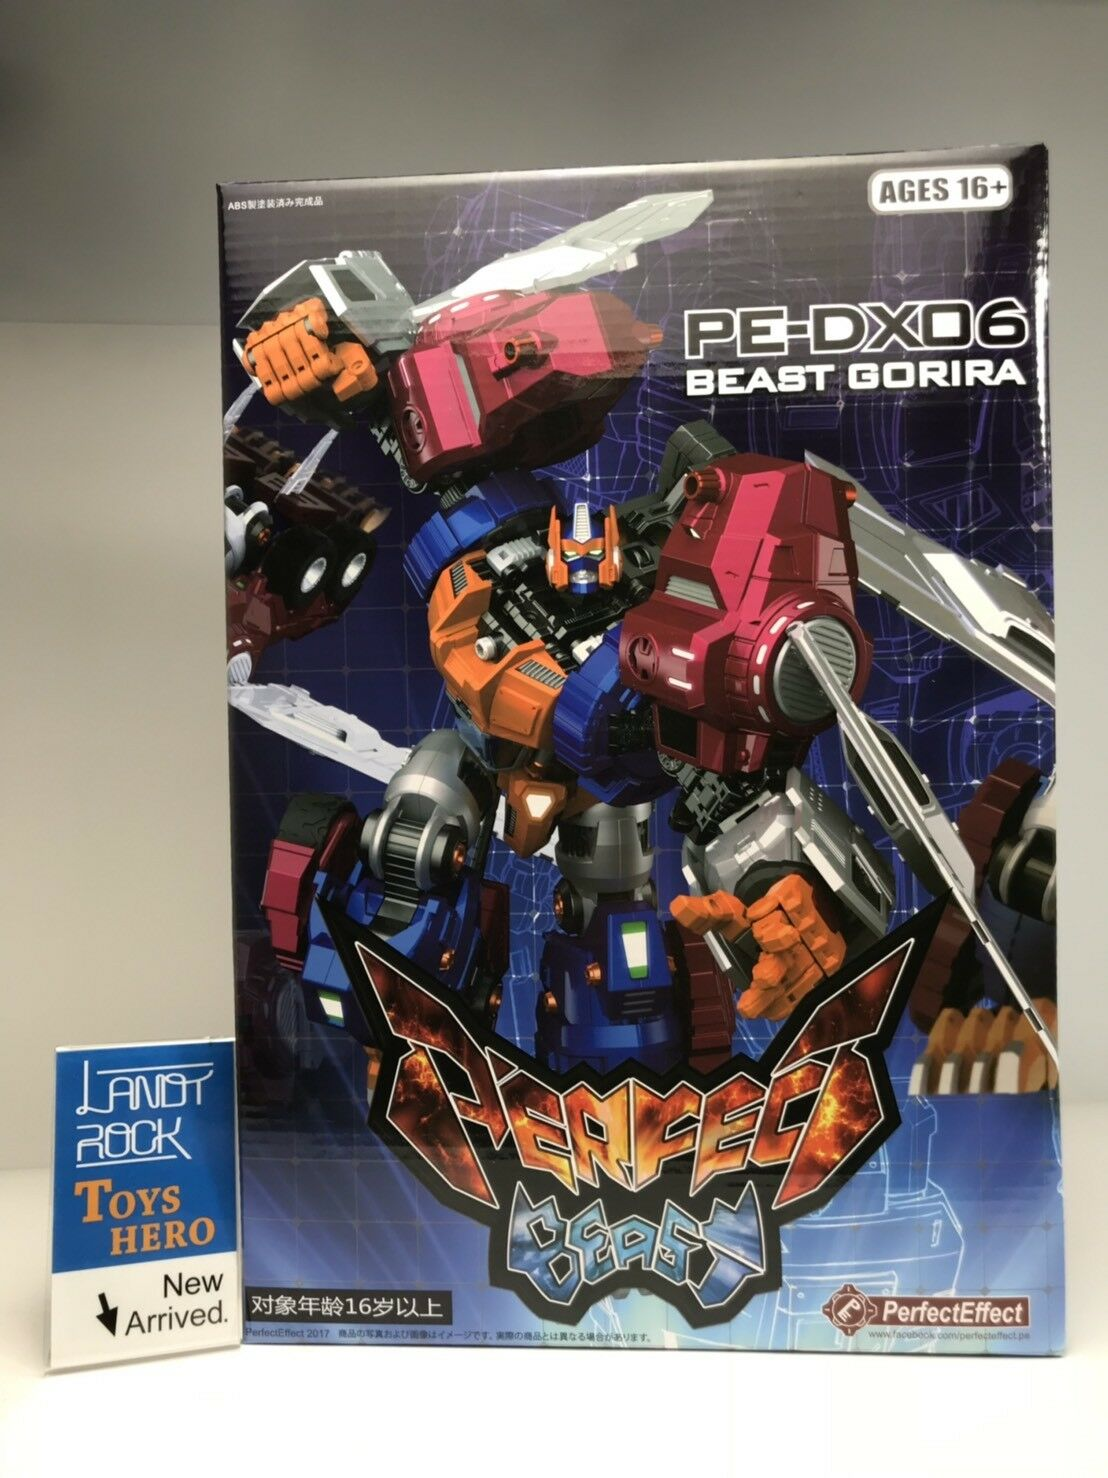 [giocattoli Hero] In he Transformers Perfect Effect PE-DX06 Beats War  Beast Gorira  economico